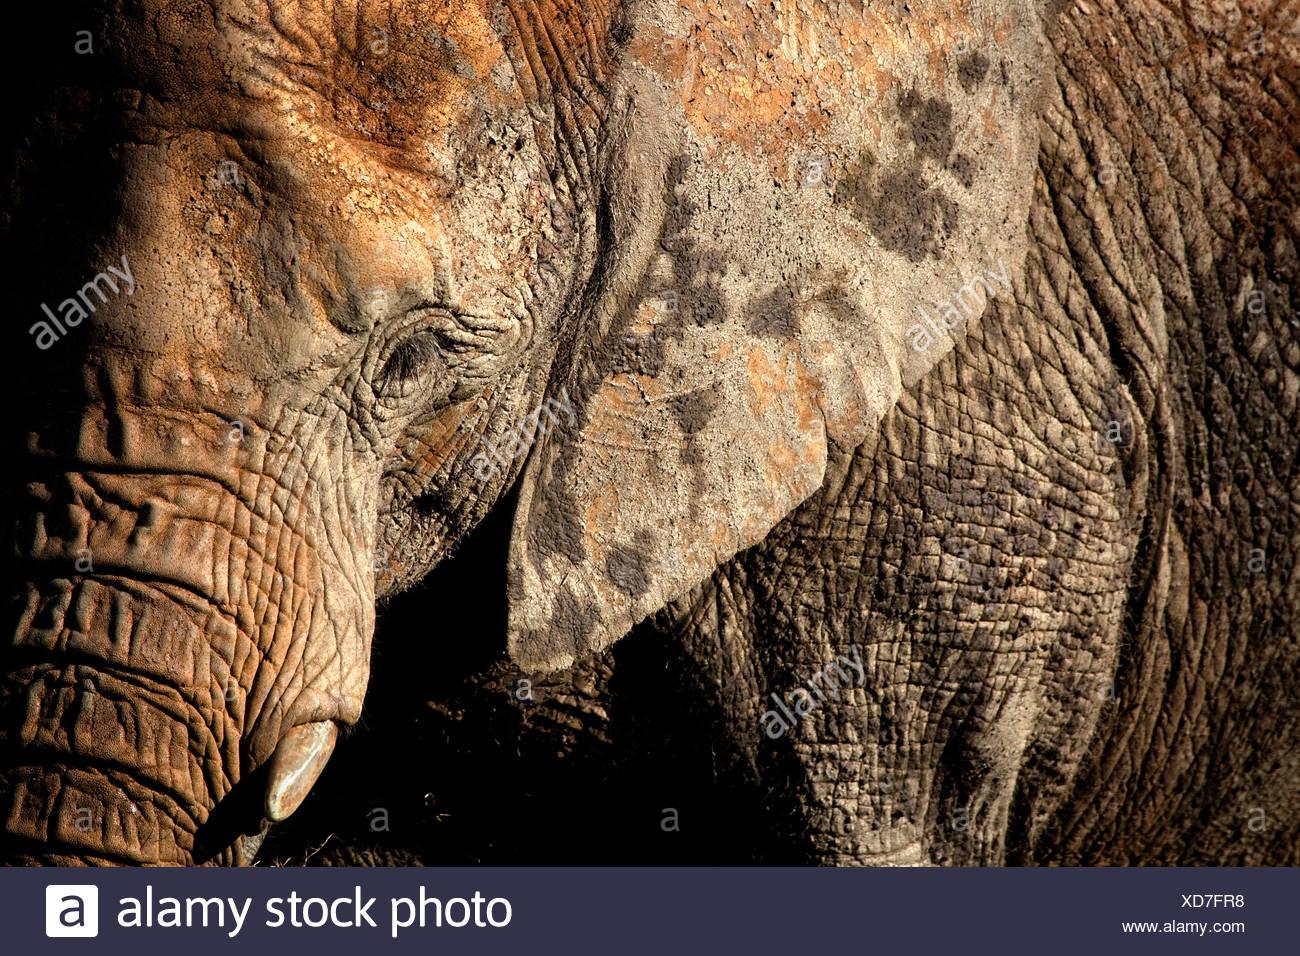 African elephant portrait, Cabarceno, Spain - Stock Image